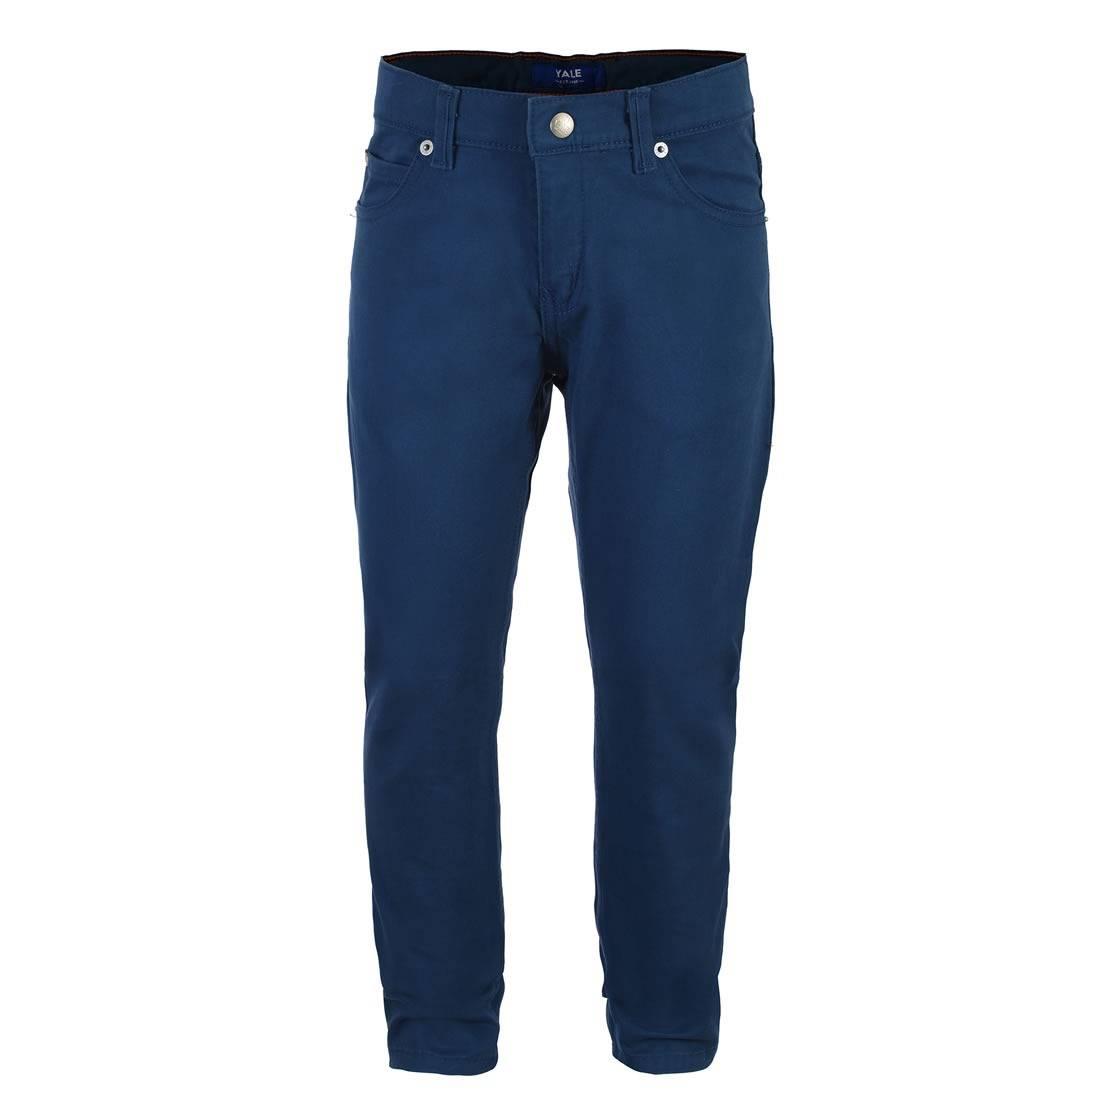 021109065414-01-Pantalon-Vaquero-Boys-Gabardina-Con-Elastano-Skinny-Fit-Cintura-Ajustable-Azul-Plumbago-yale